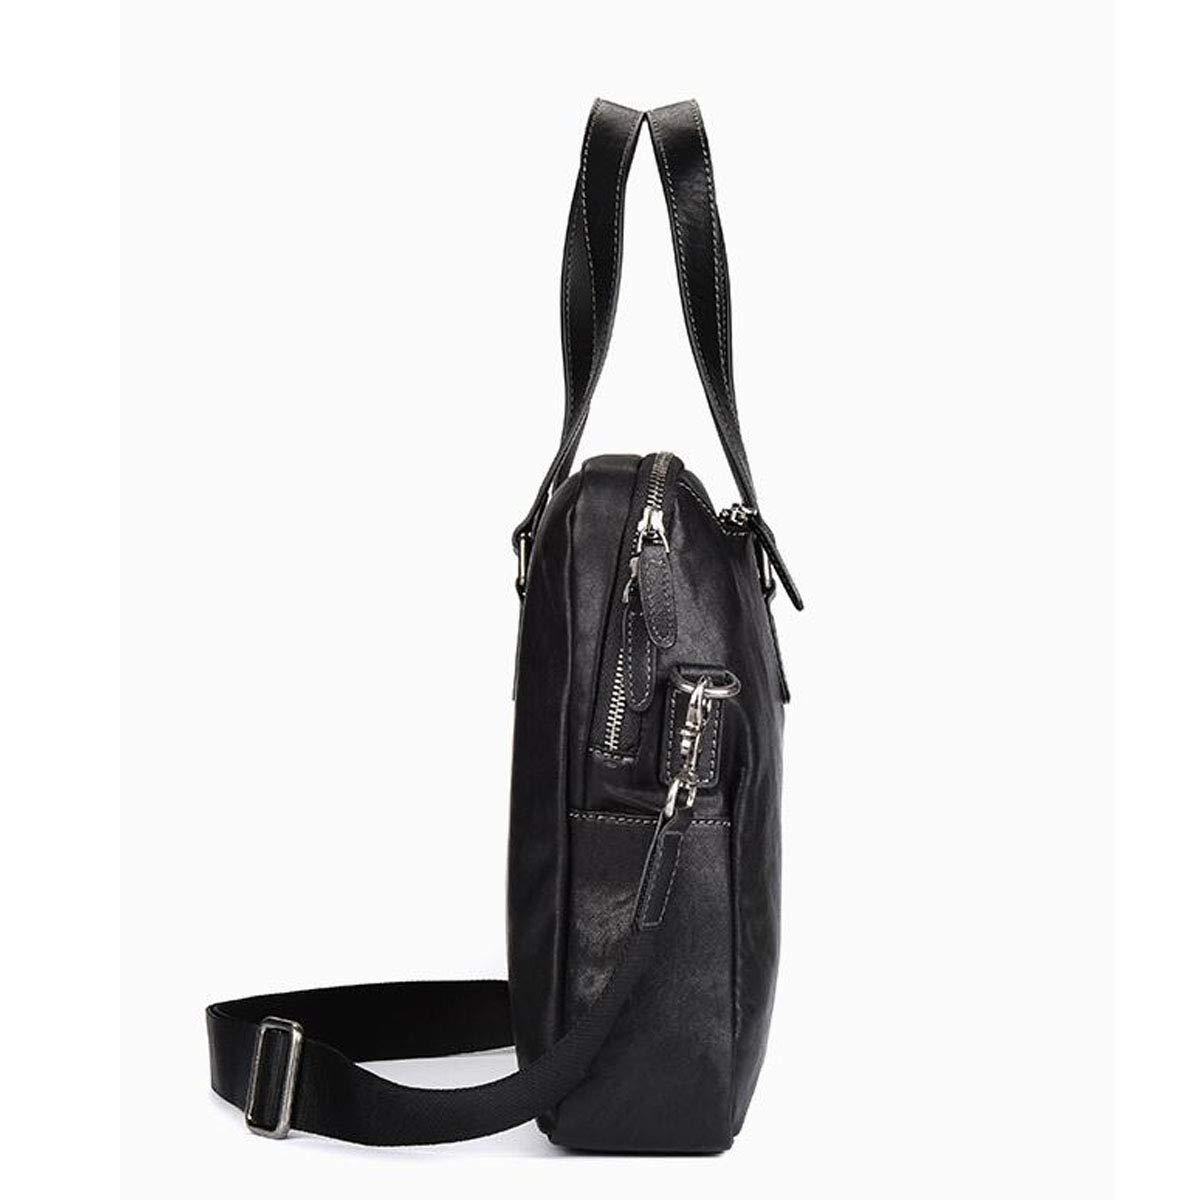 Black /· Size: 38 9 29.5cm Leather Mens Handbag Kuqiqi Briefcase Lightweight Vegetable Tanned Leather Color : Black Business Computer Bag Large-Capacity Backpack